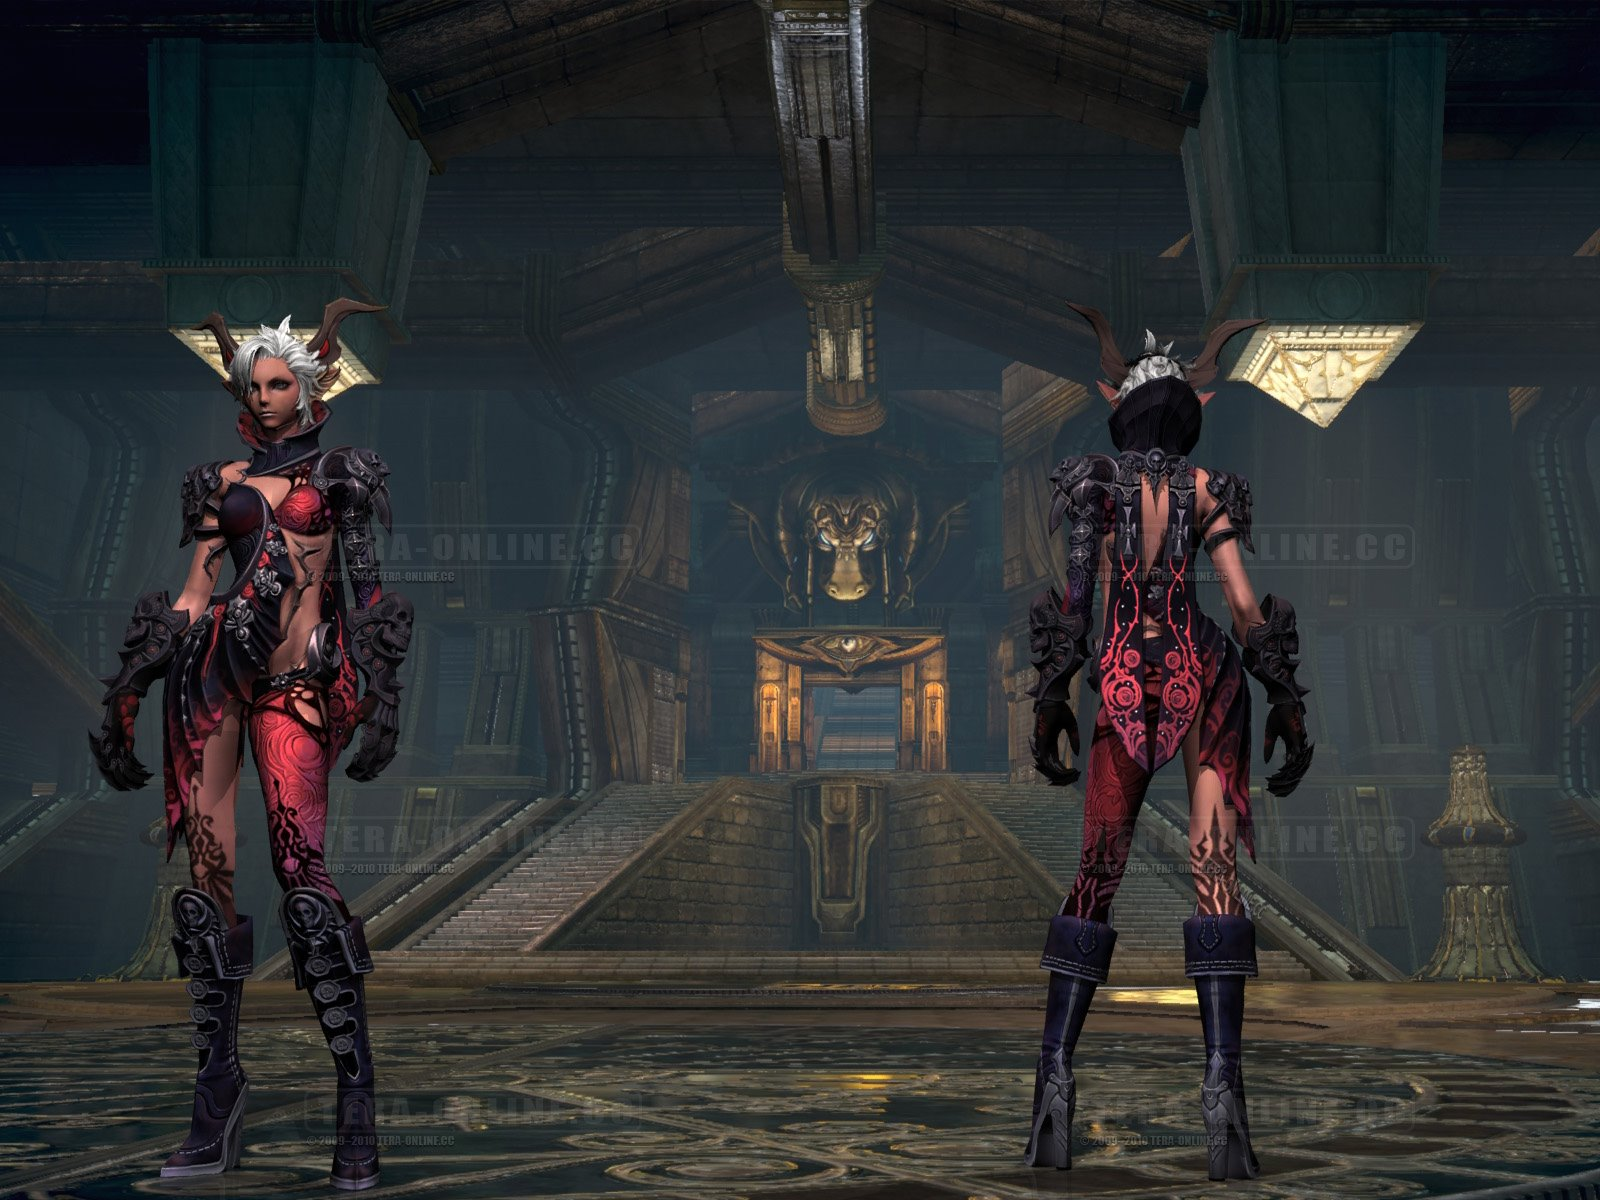 Tera Online Armor